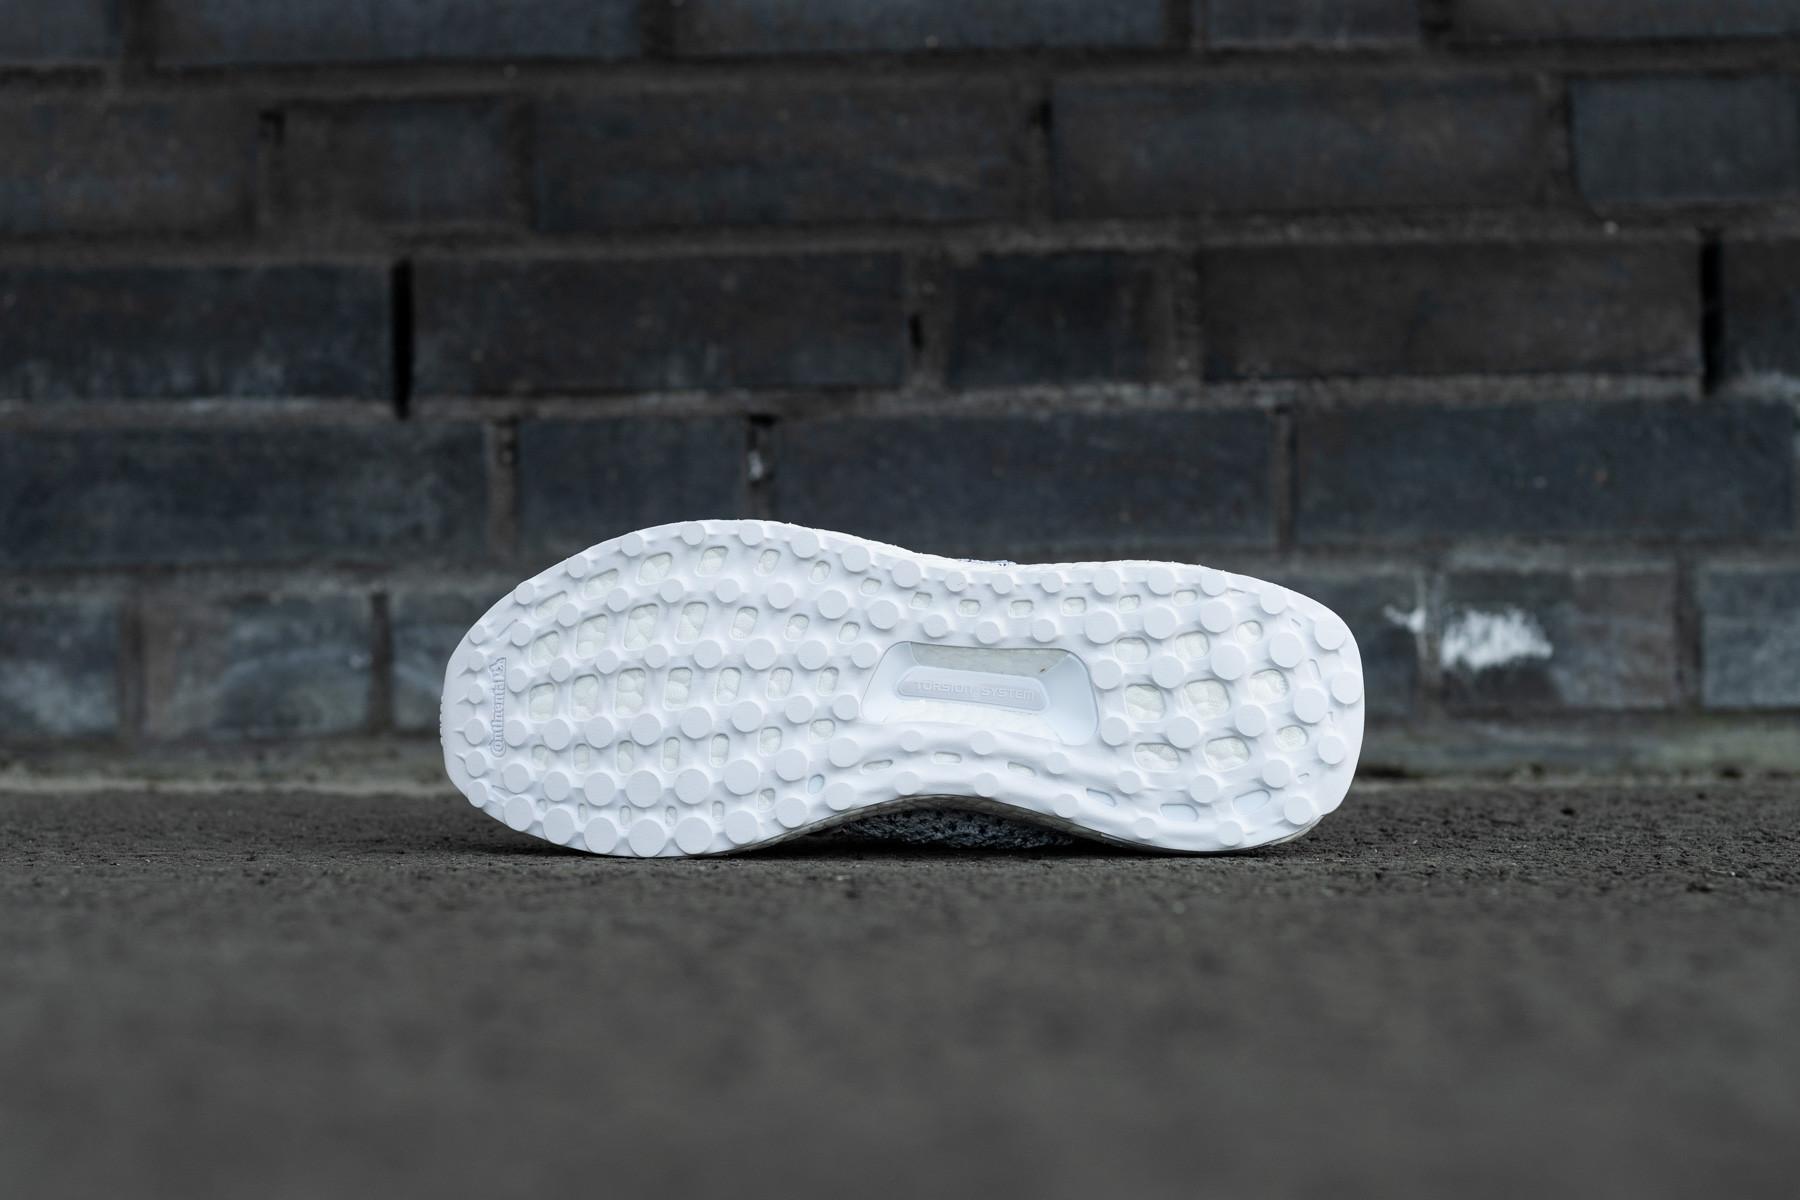 Adidas UltraBOOST Parley LTD Sneaker.no